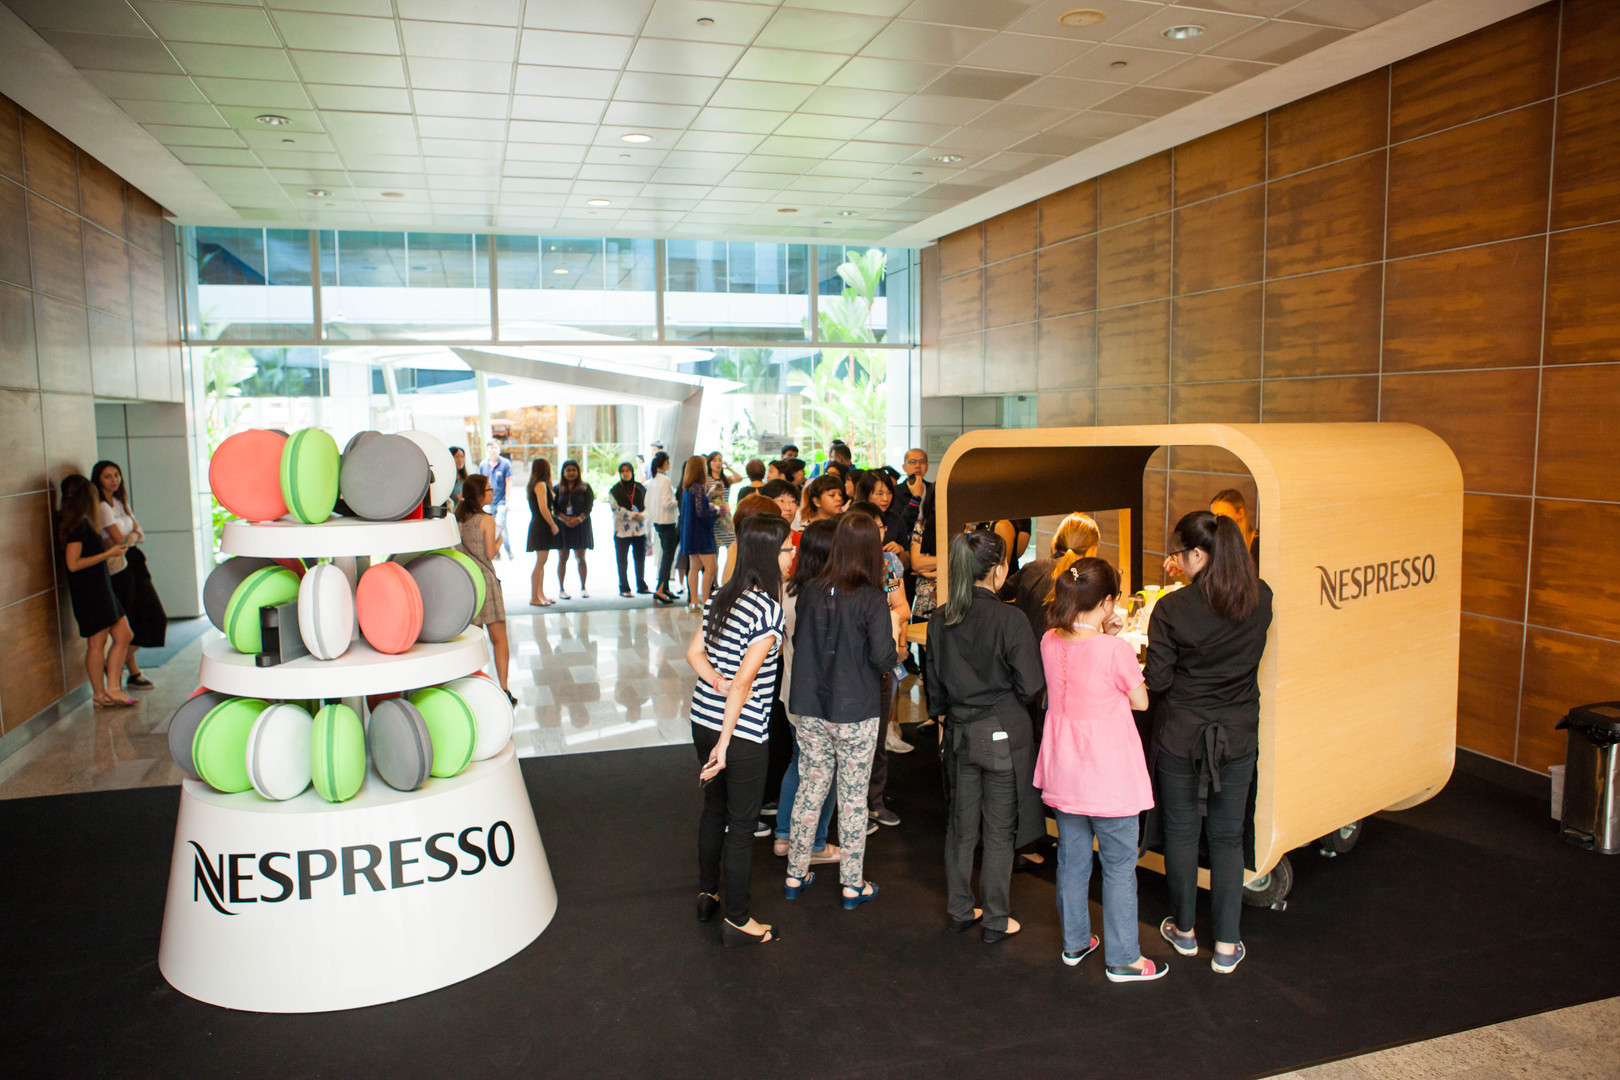 Nespresso_SPH-1025.jpg